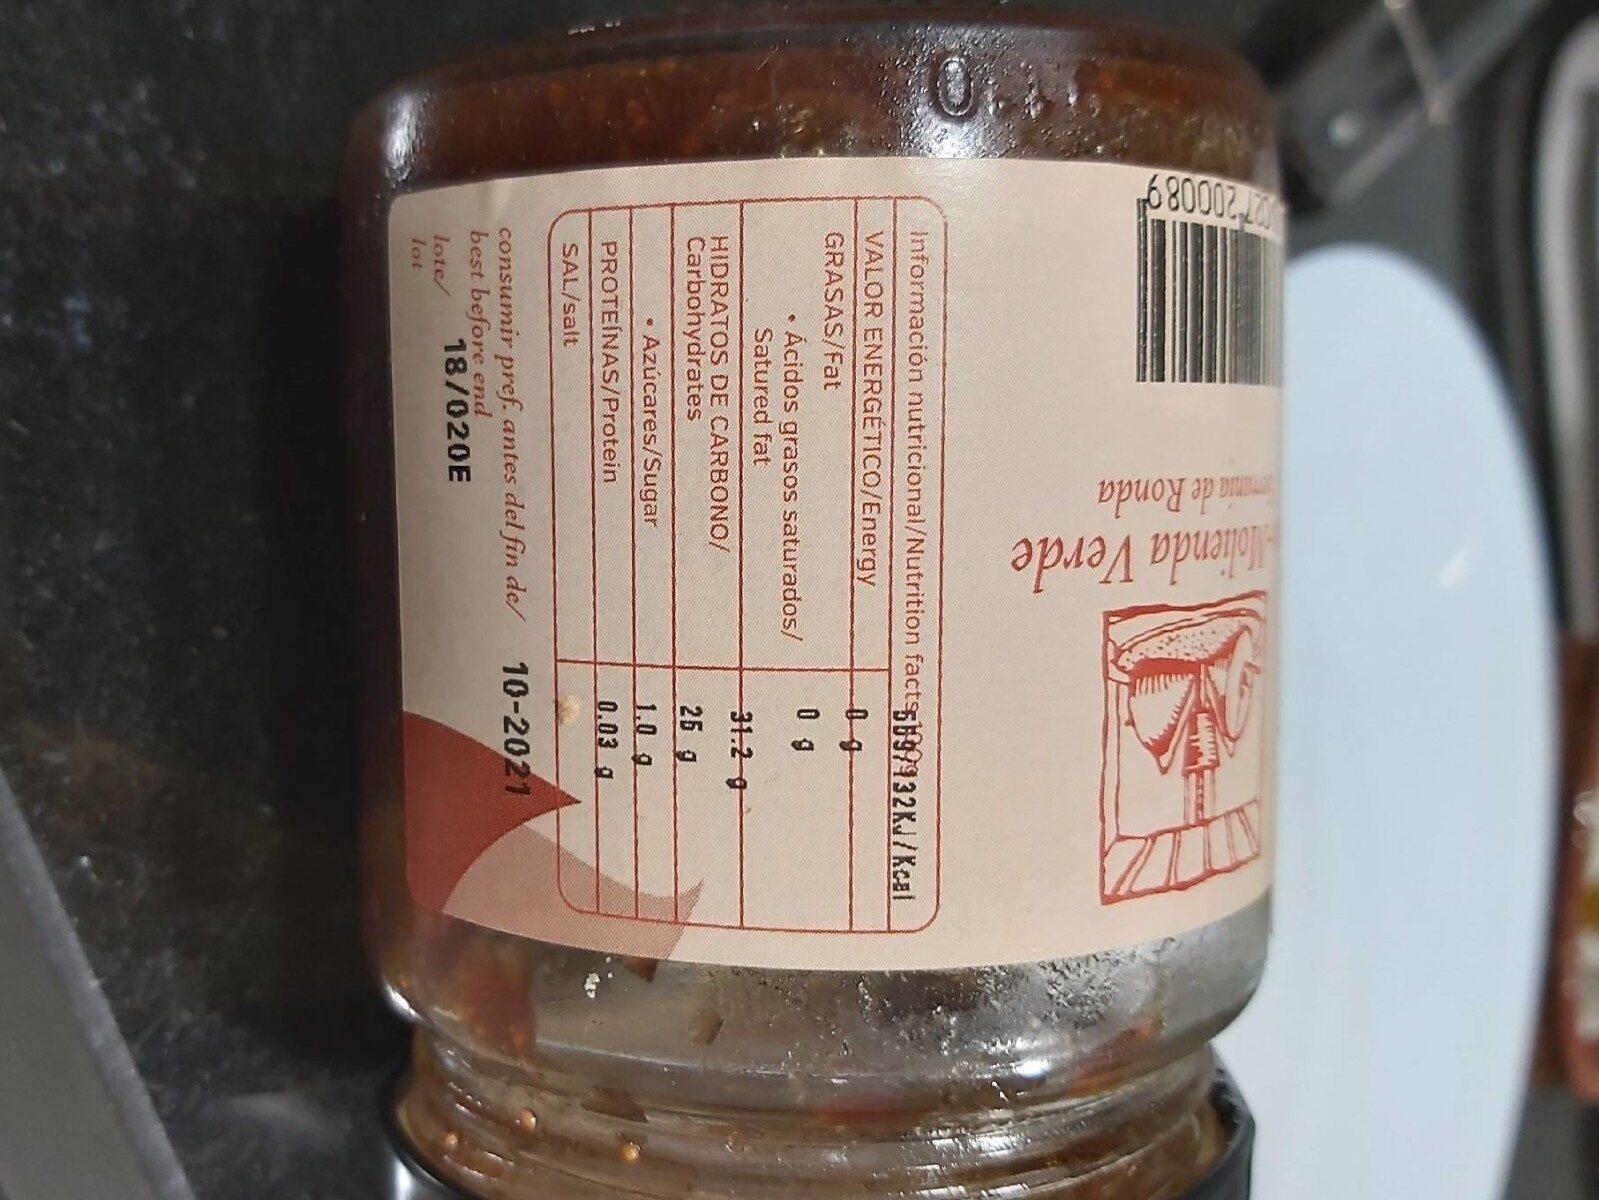 Mermelada de higos - Nutrition facts